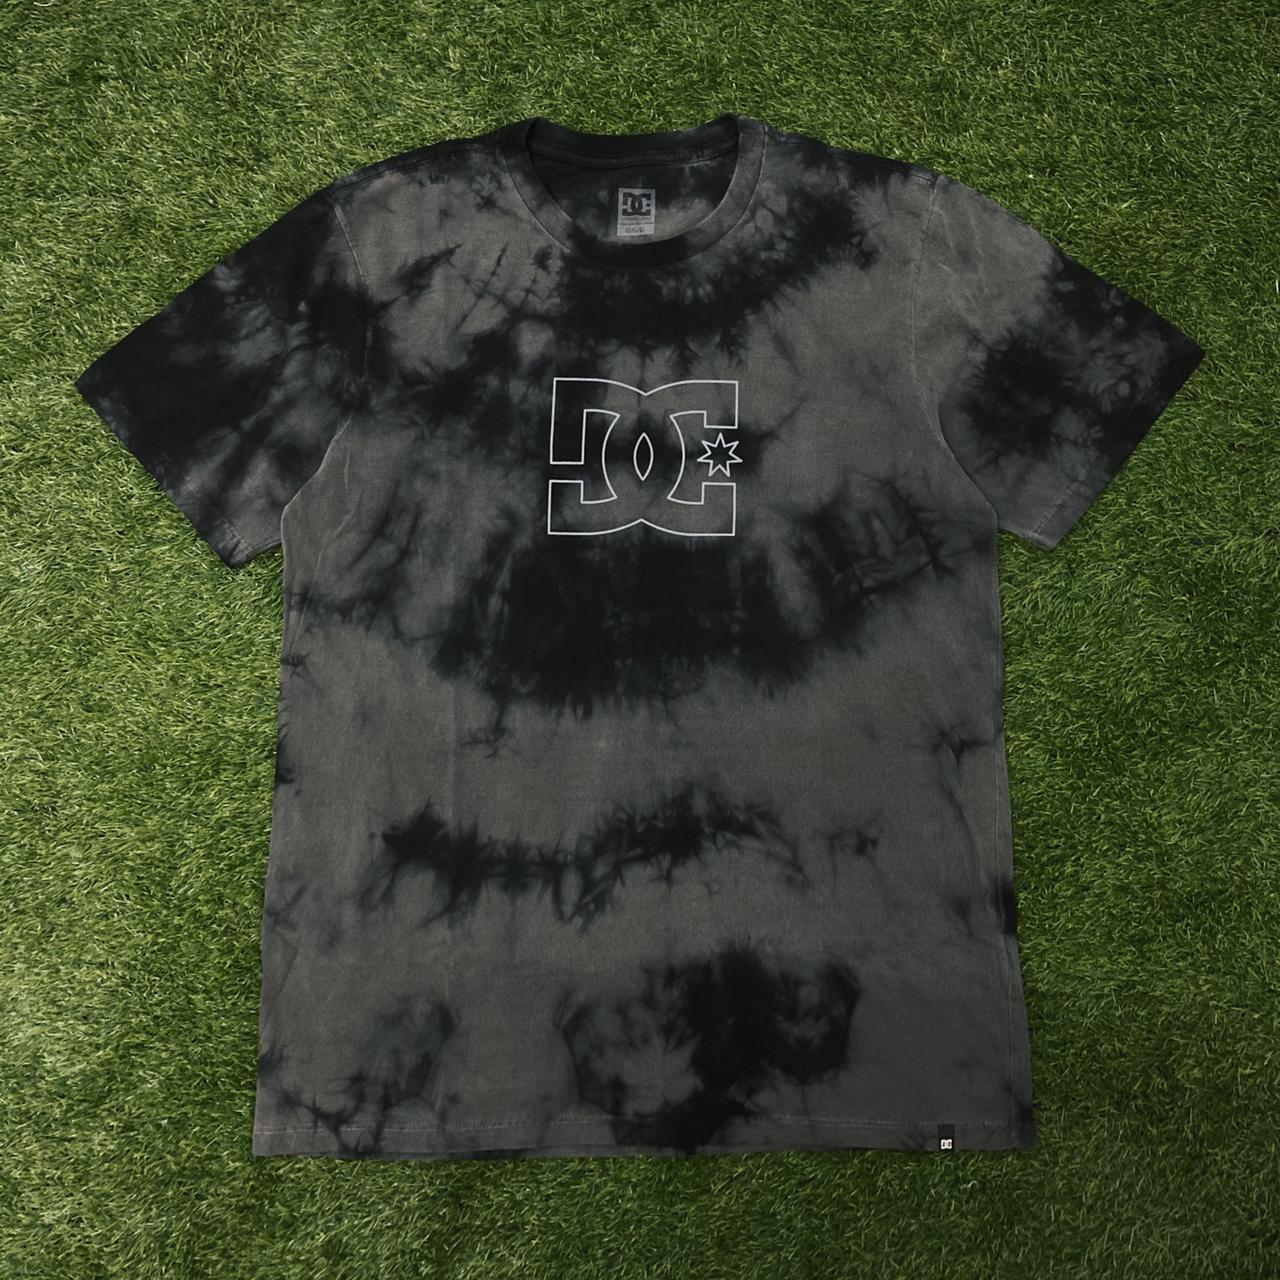 Camiseta dc cloudy tie dye preta